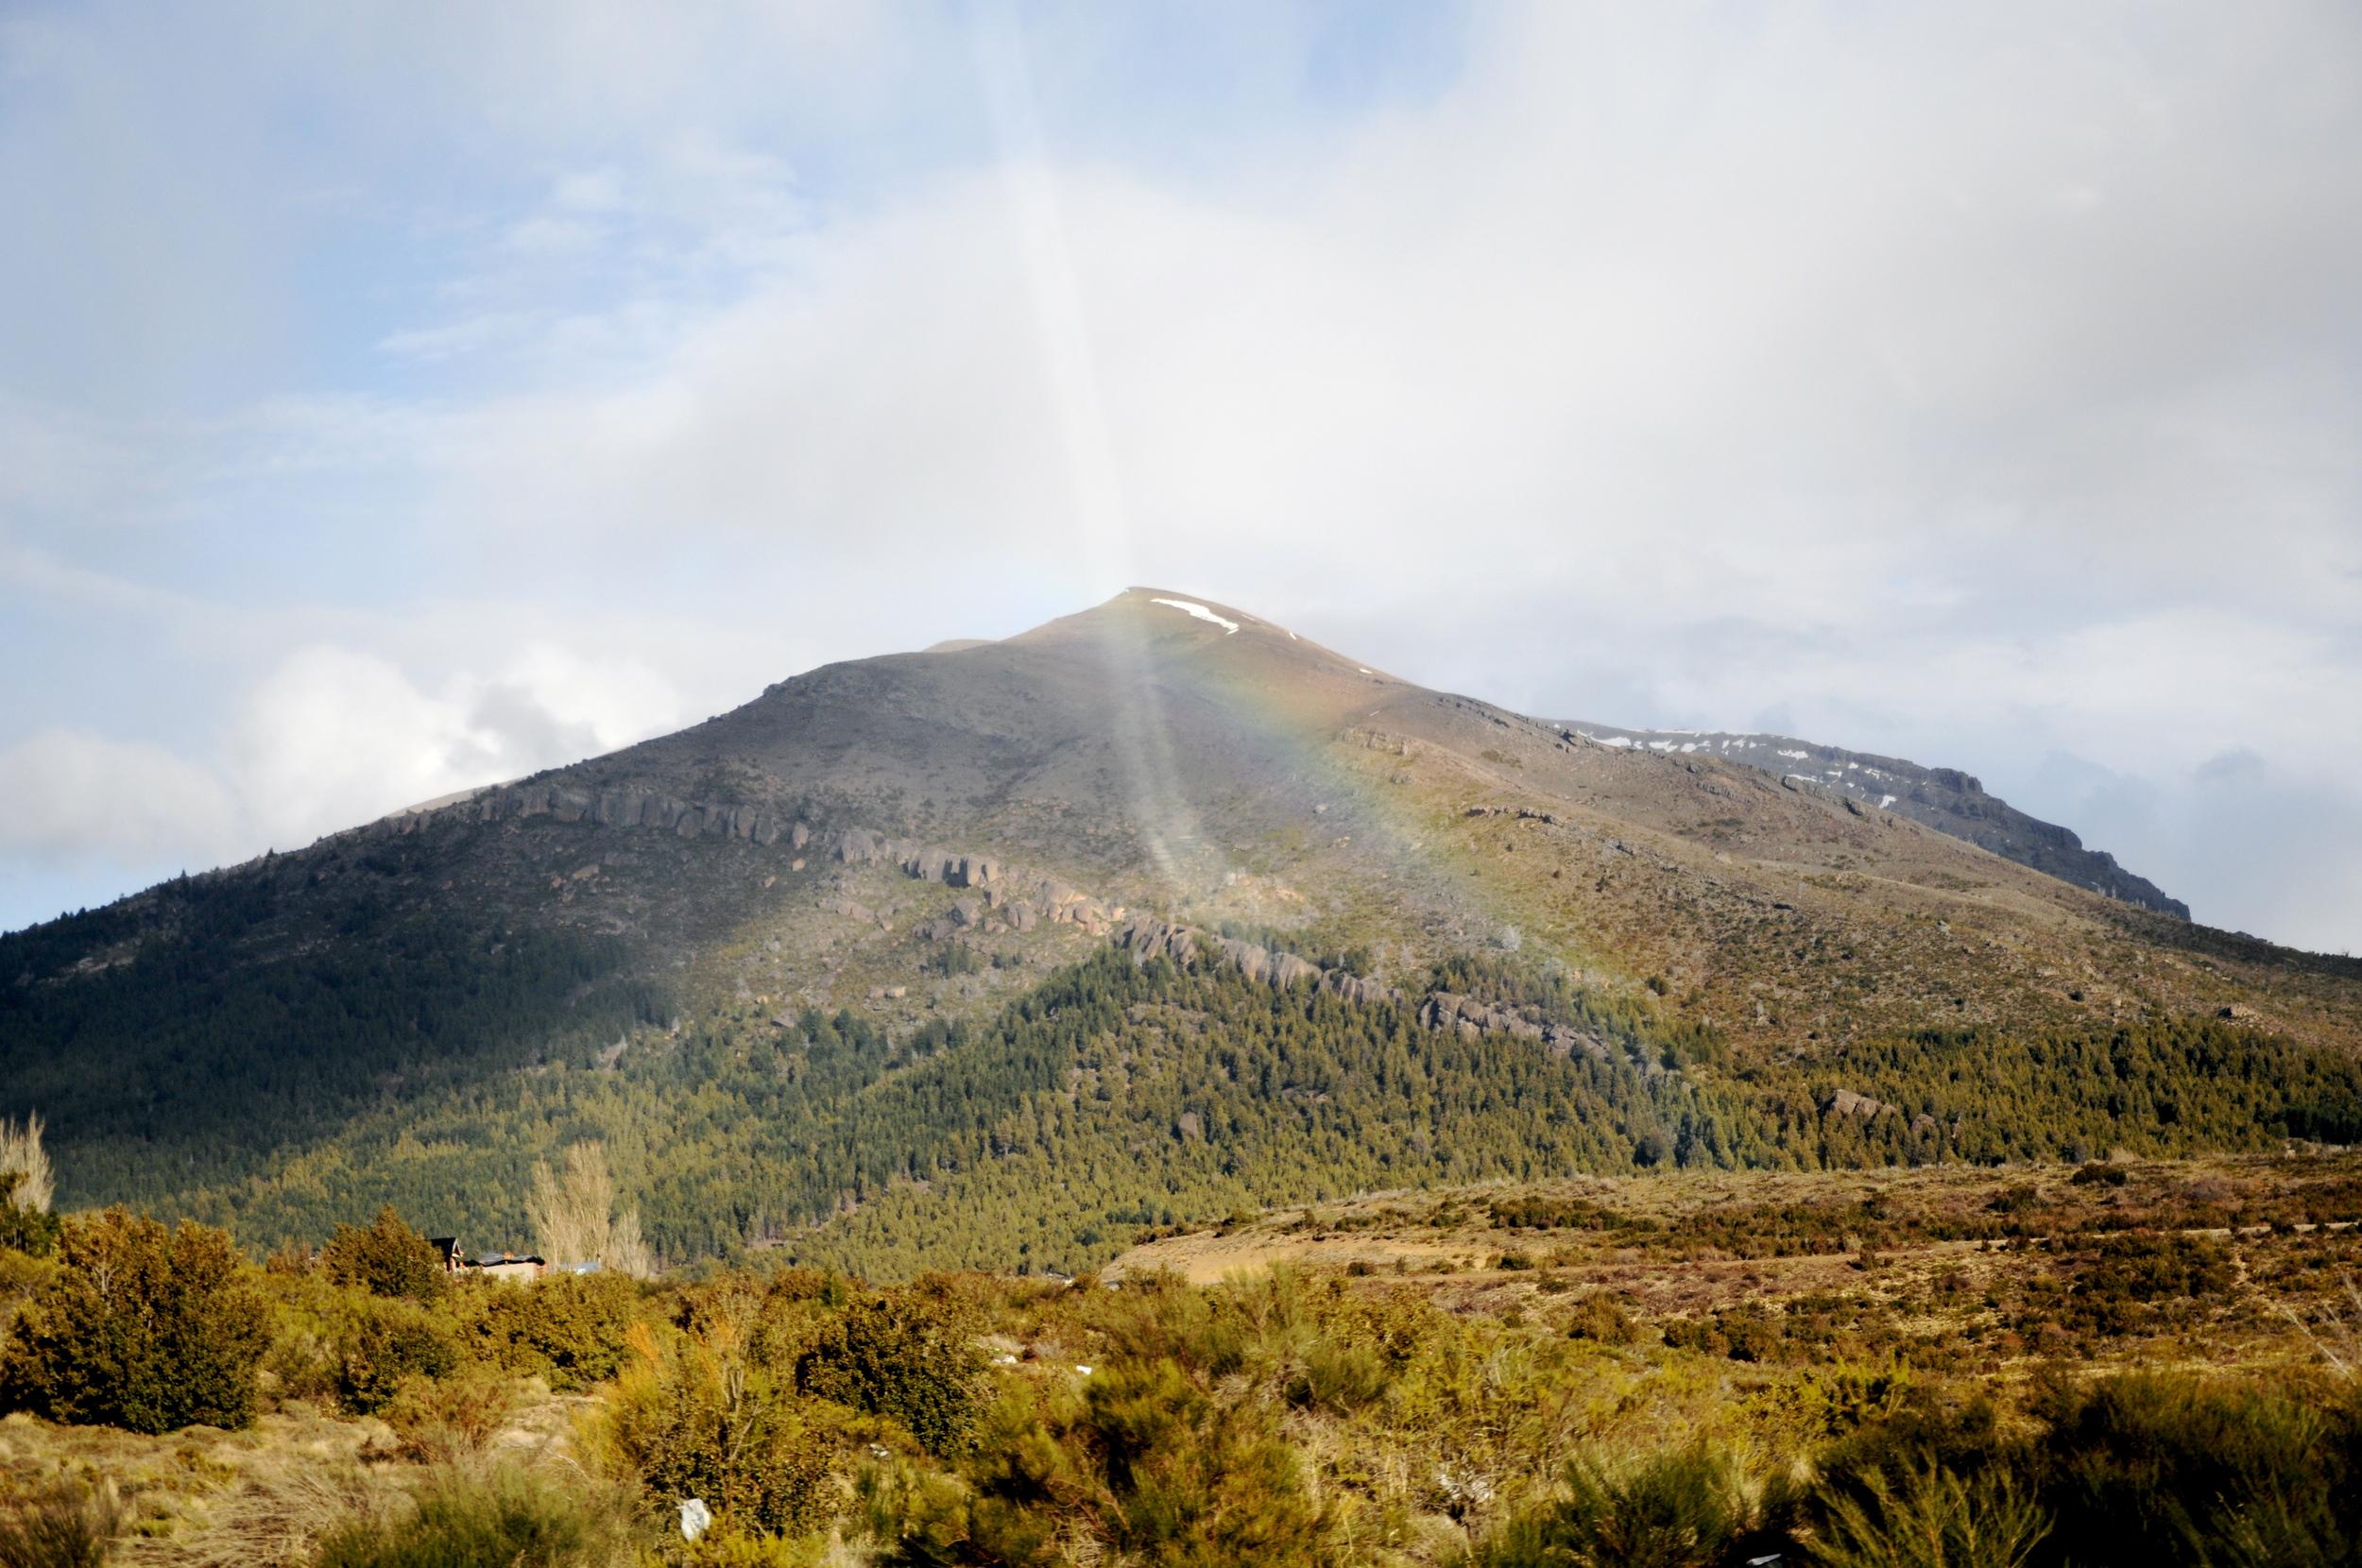 Rainbows in Patagonia